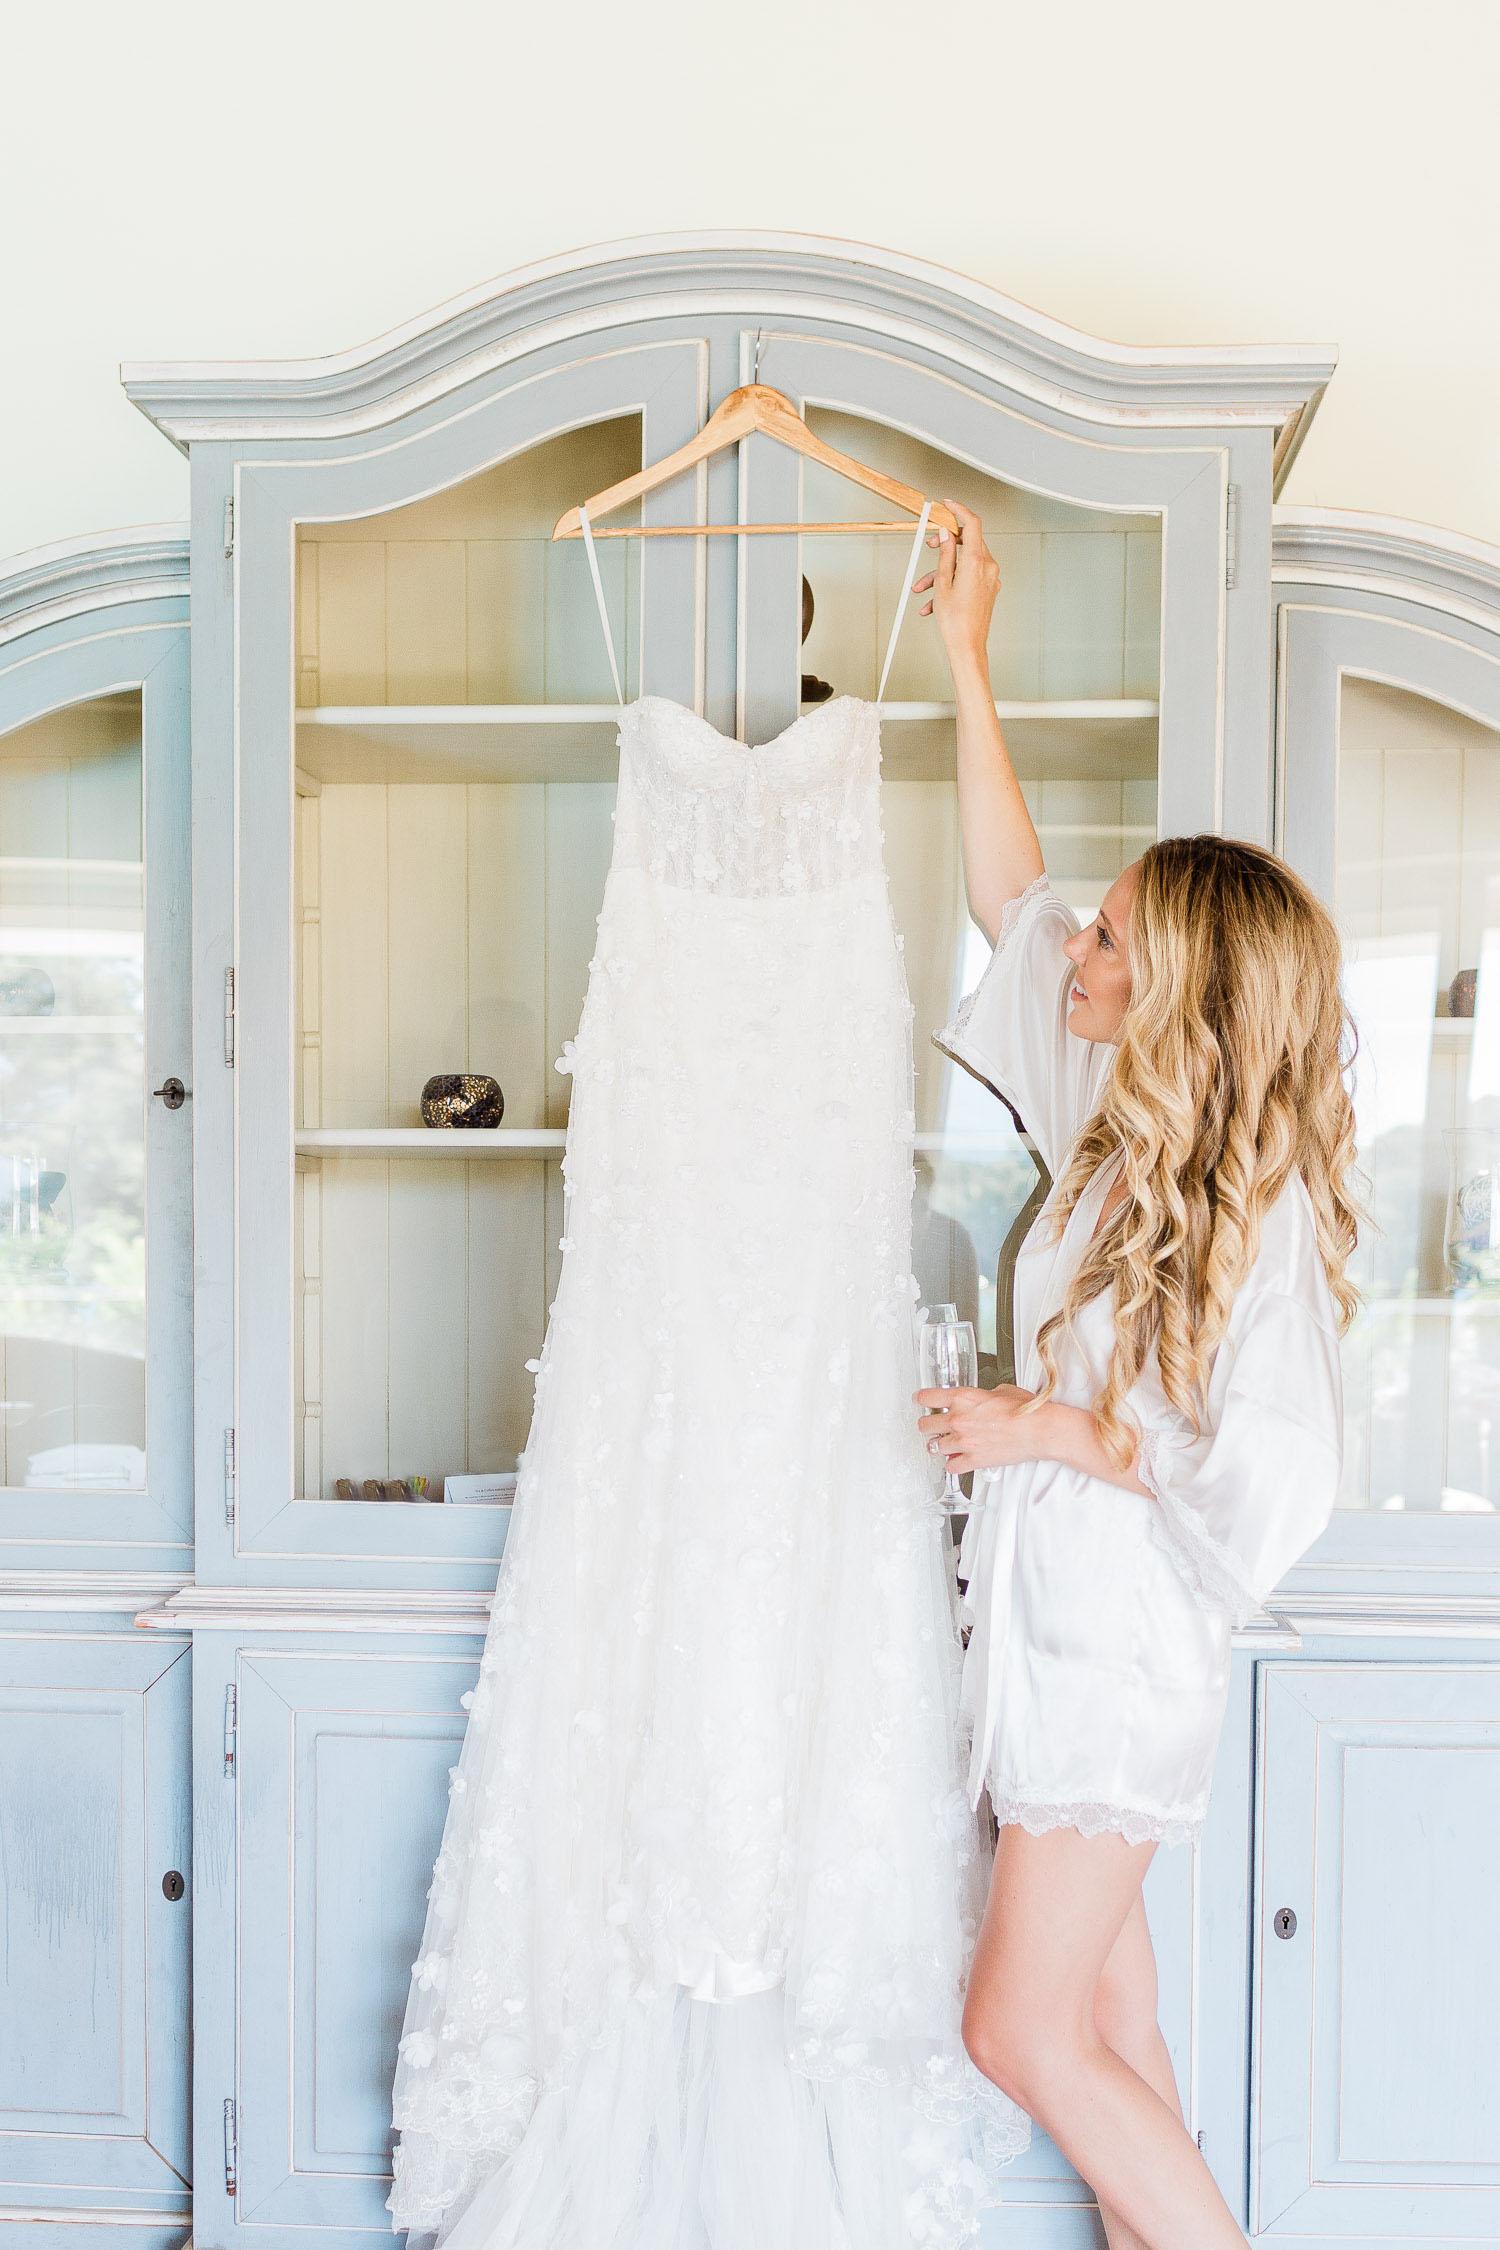 stunning bride loves her romantic wedding dress on a July wedding in Corfu